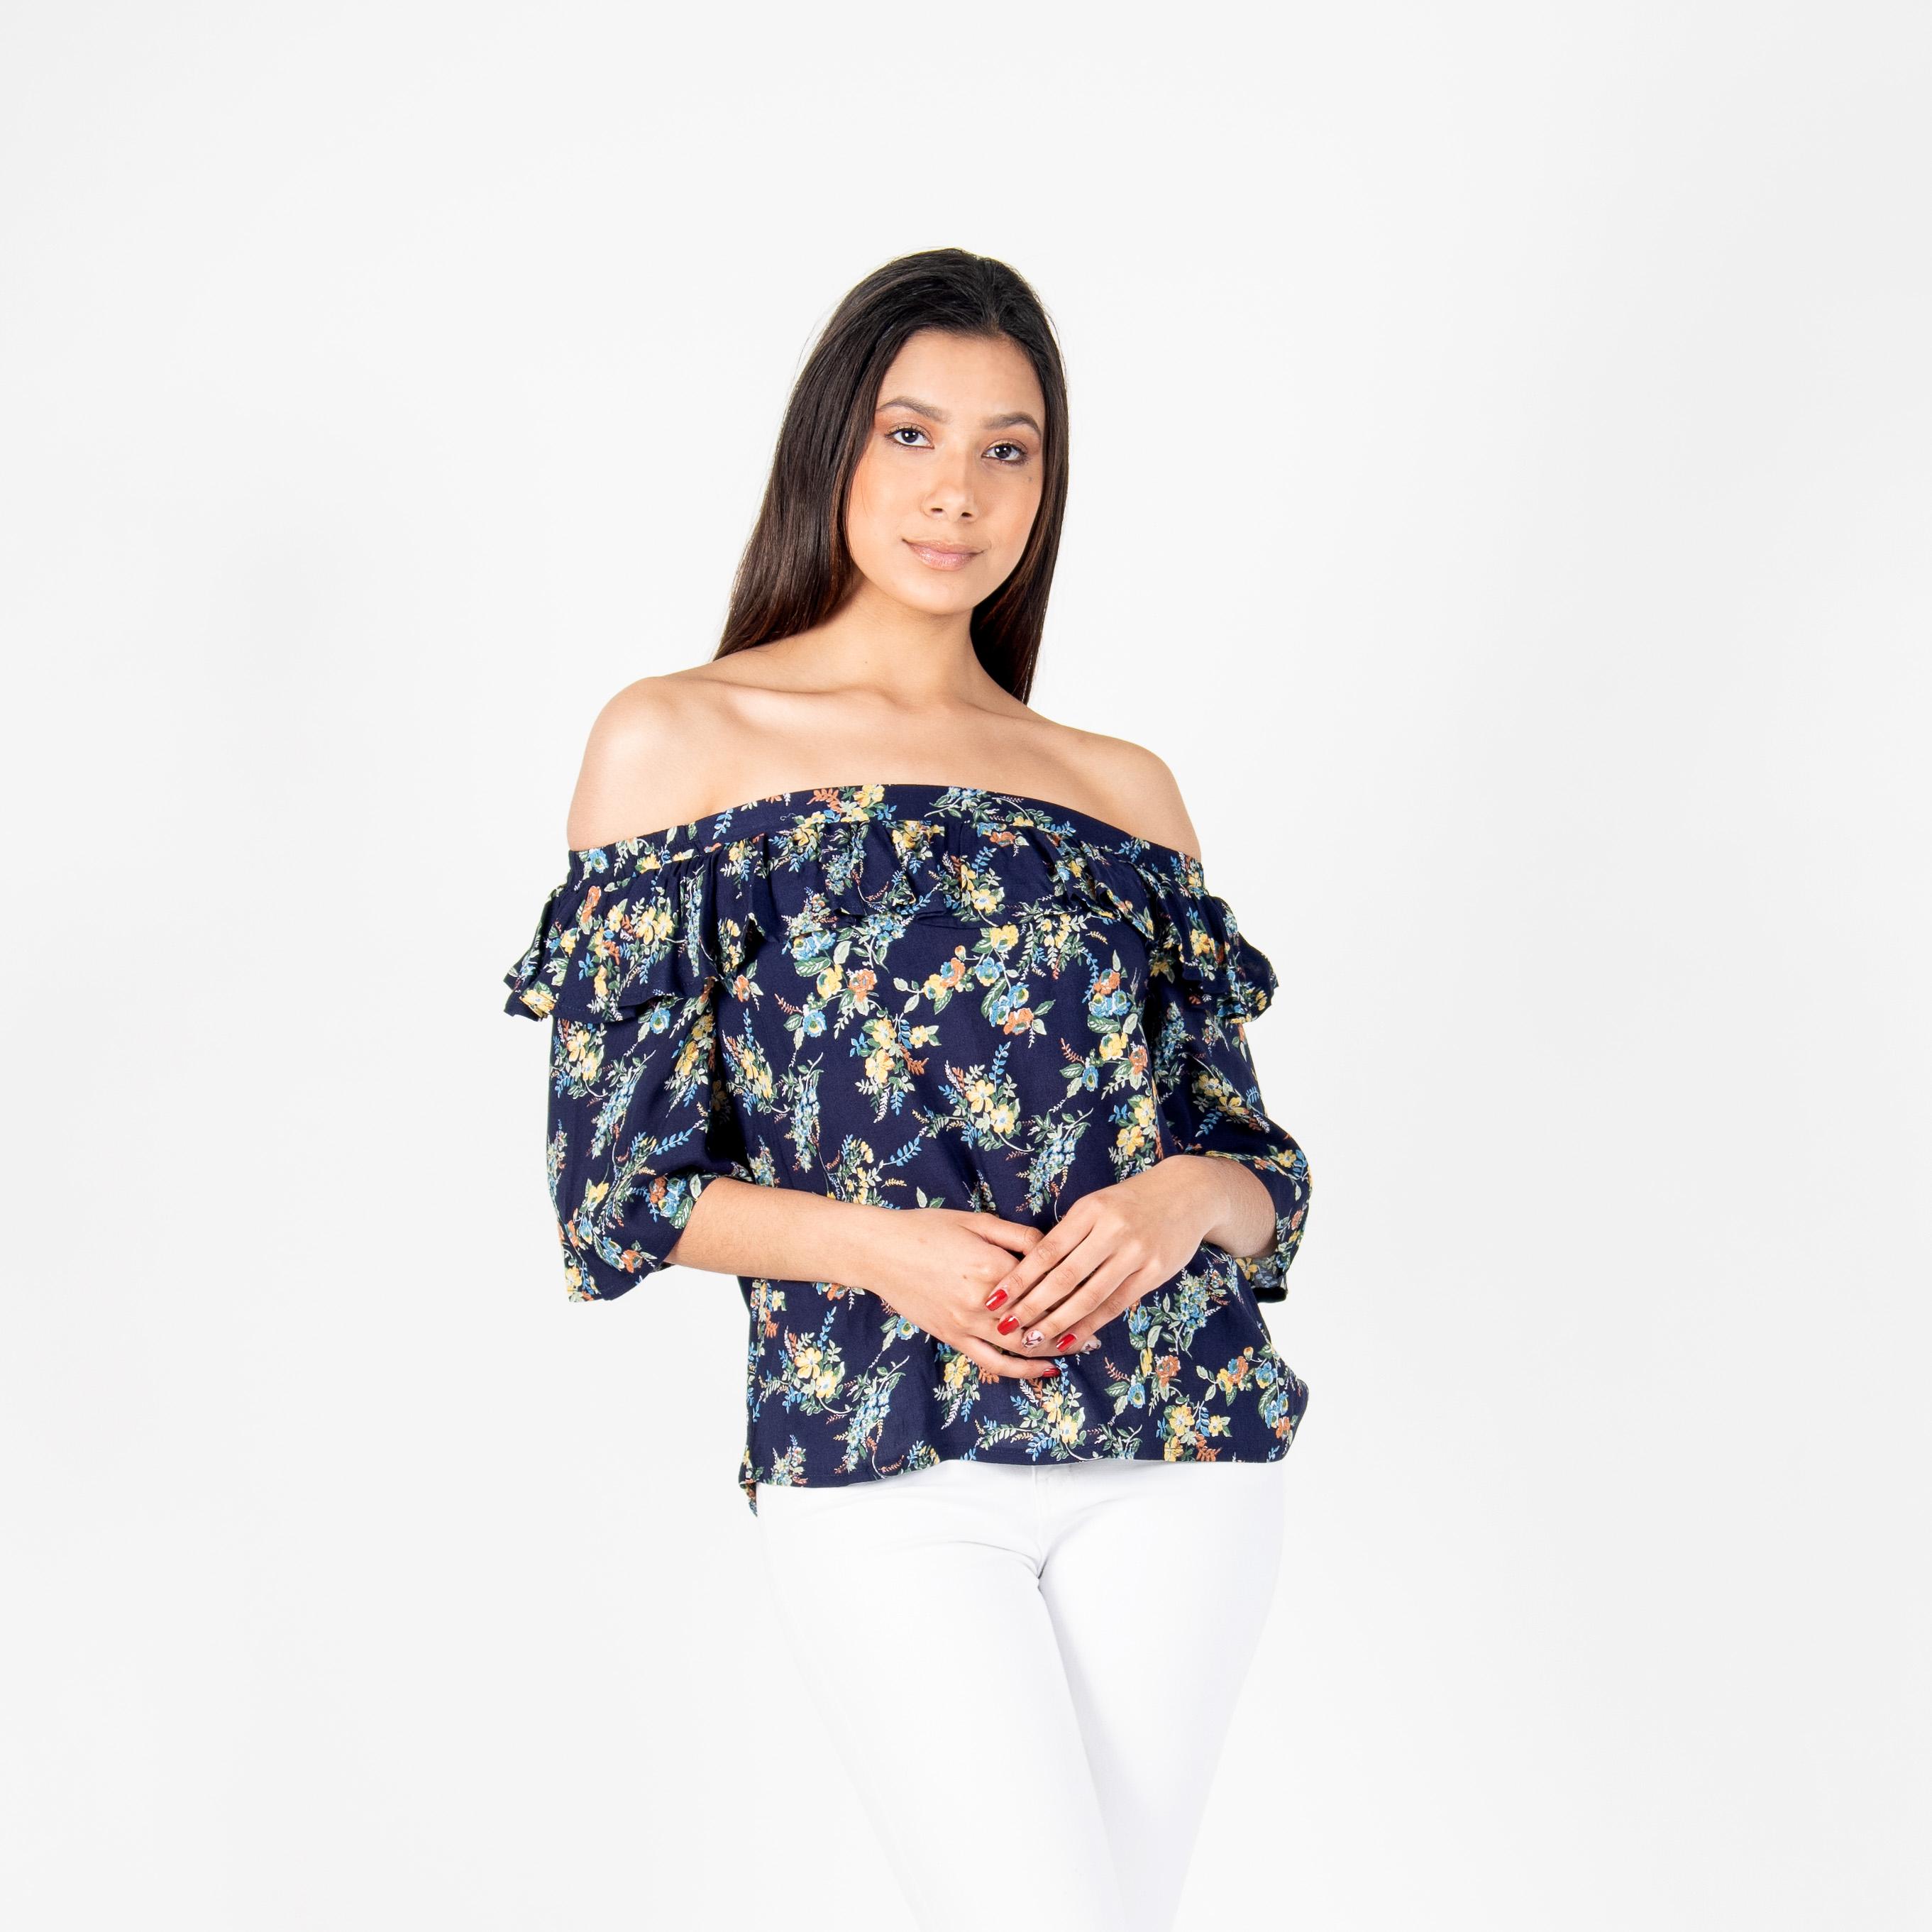 Blusa Vuelos Flores